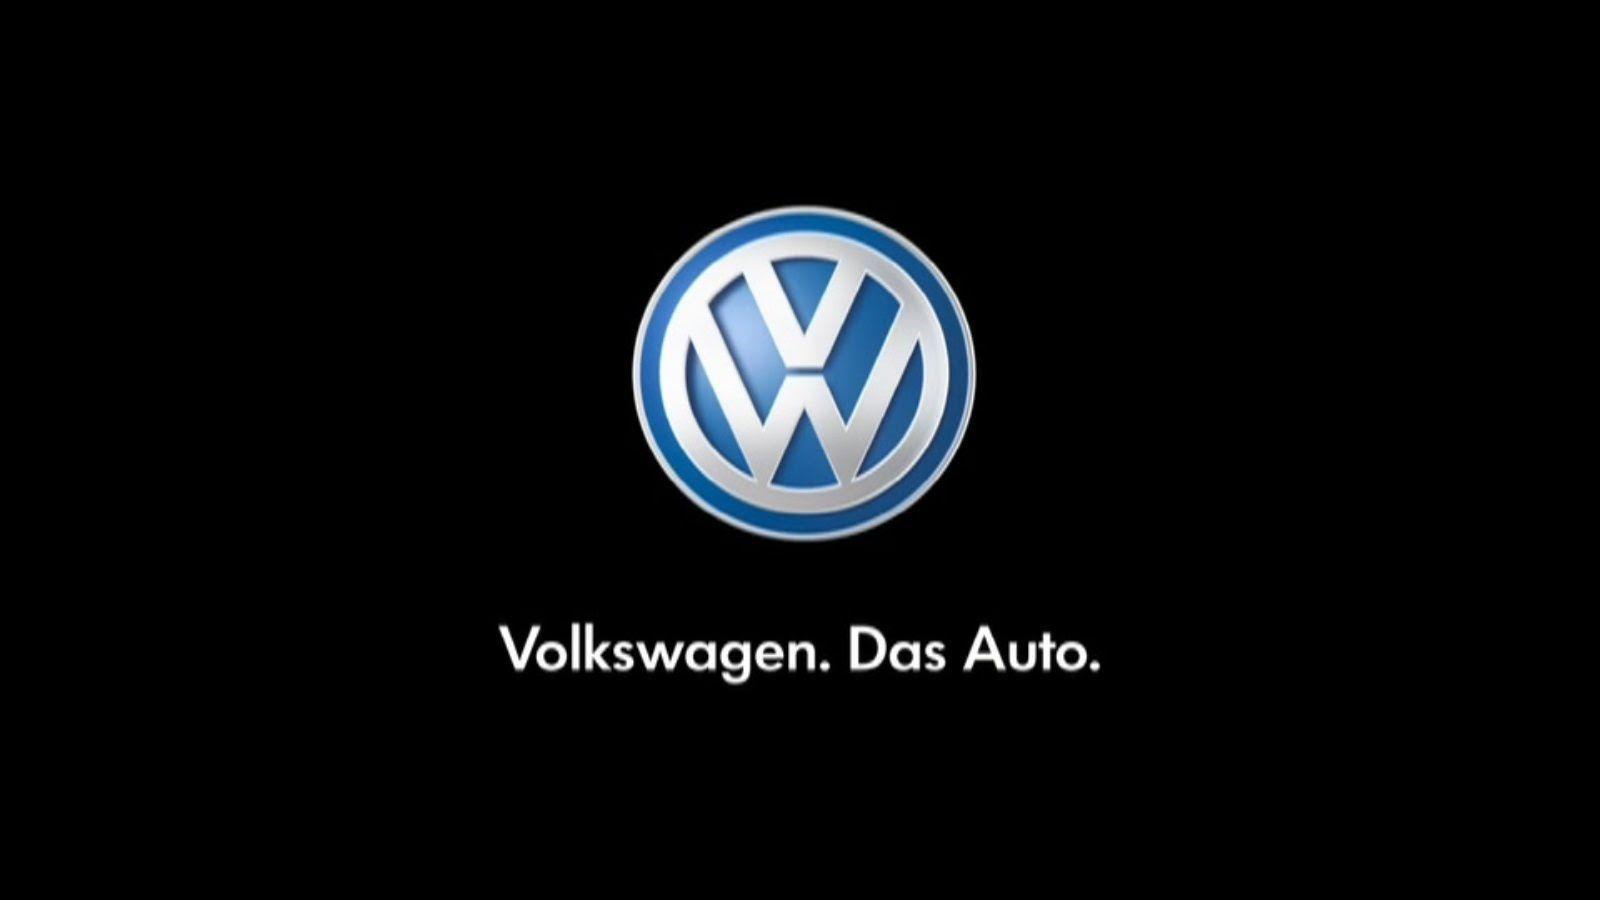 VW Logo Wallpapers